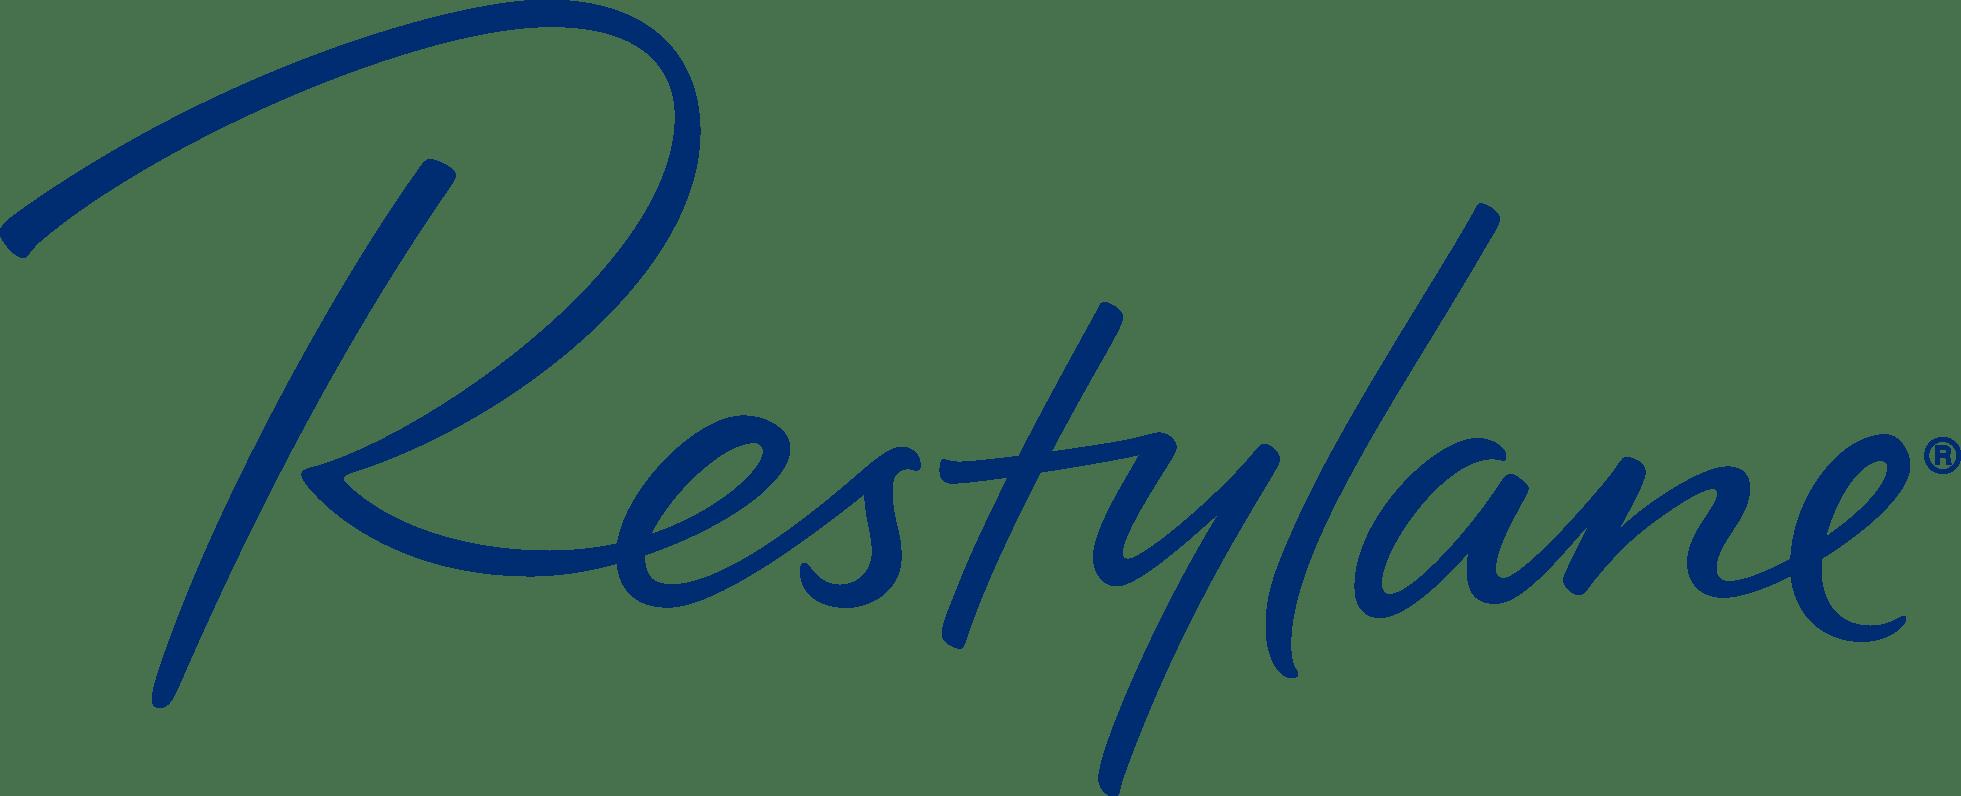 Restylane Wrinkle Treatment